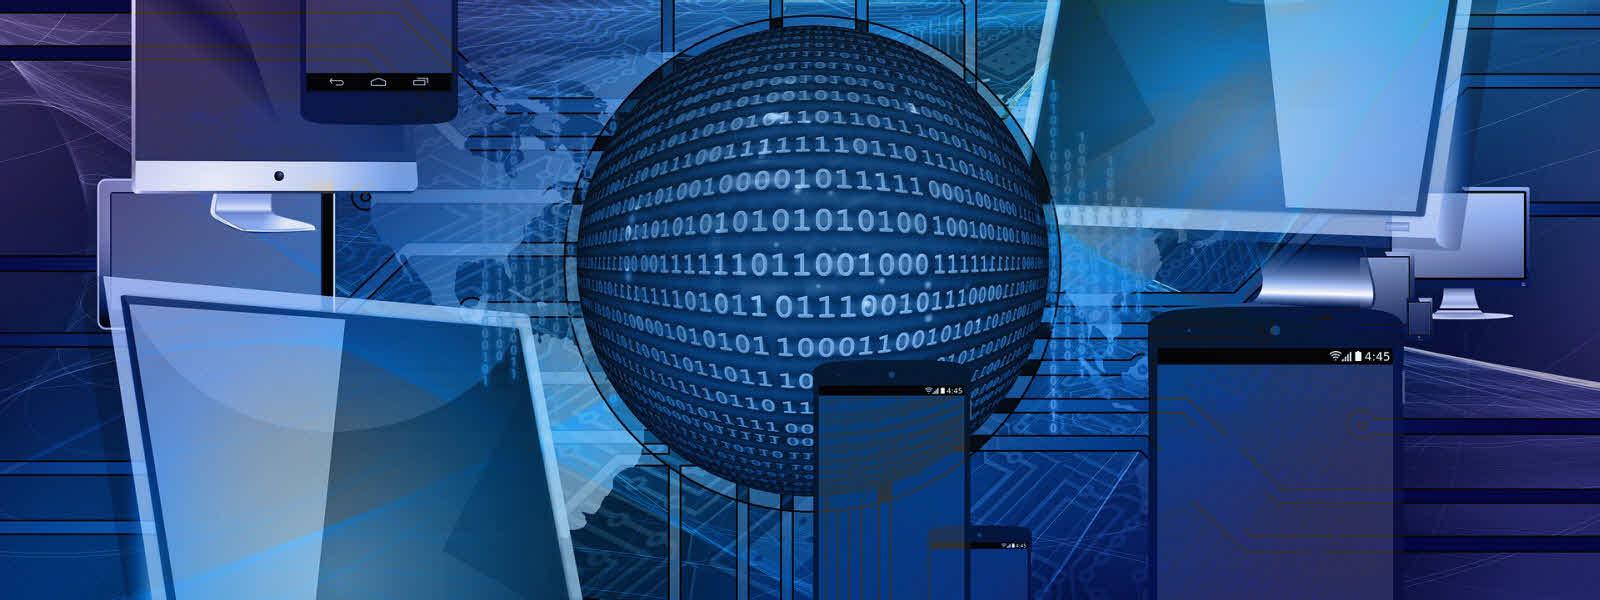 Key Technologies that Help Drive Tech Distribution Growth